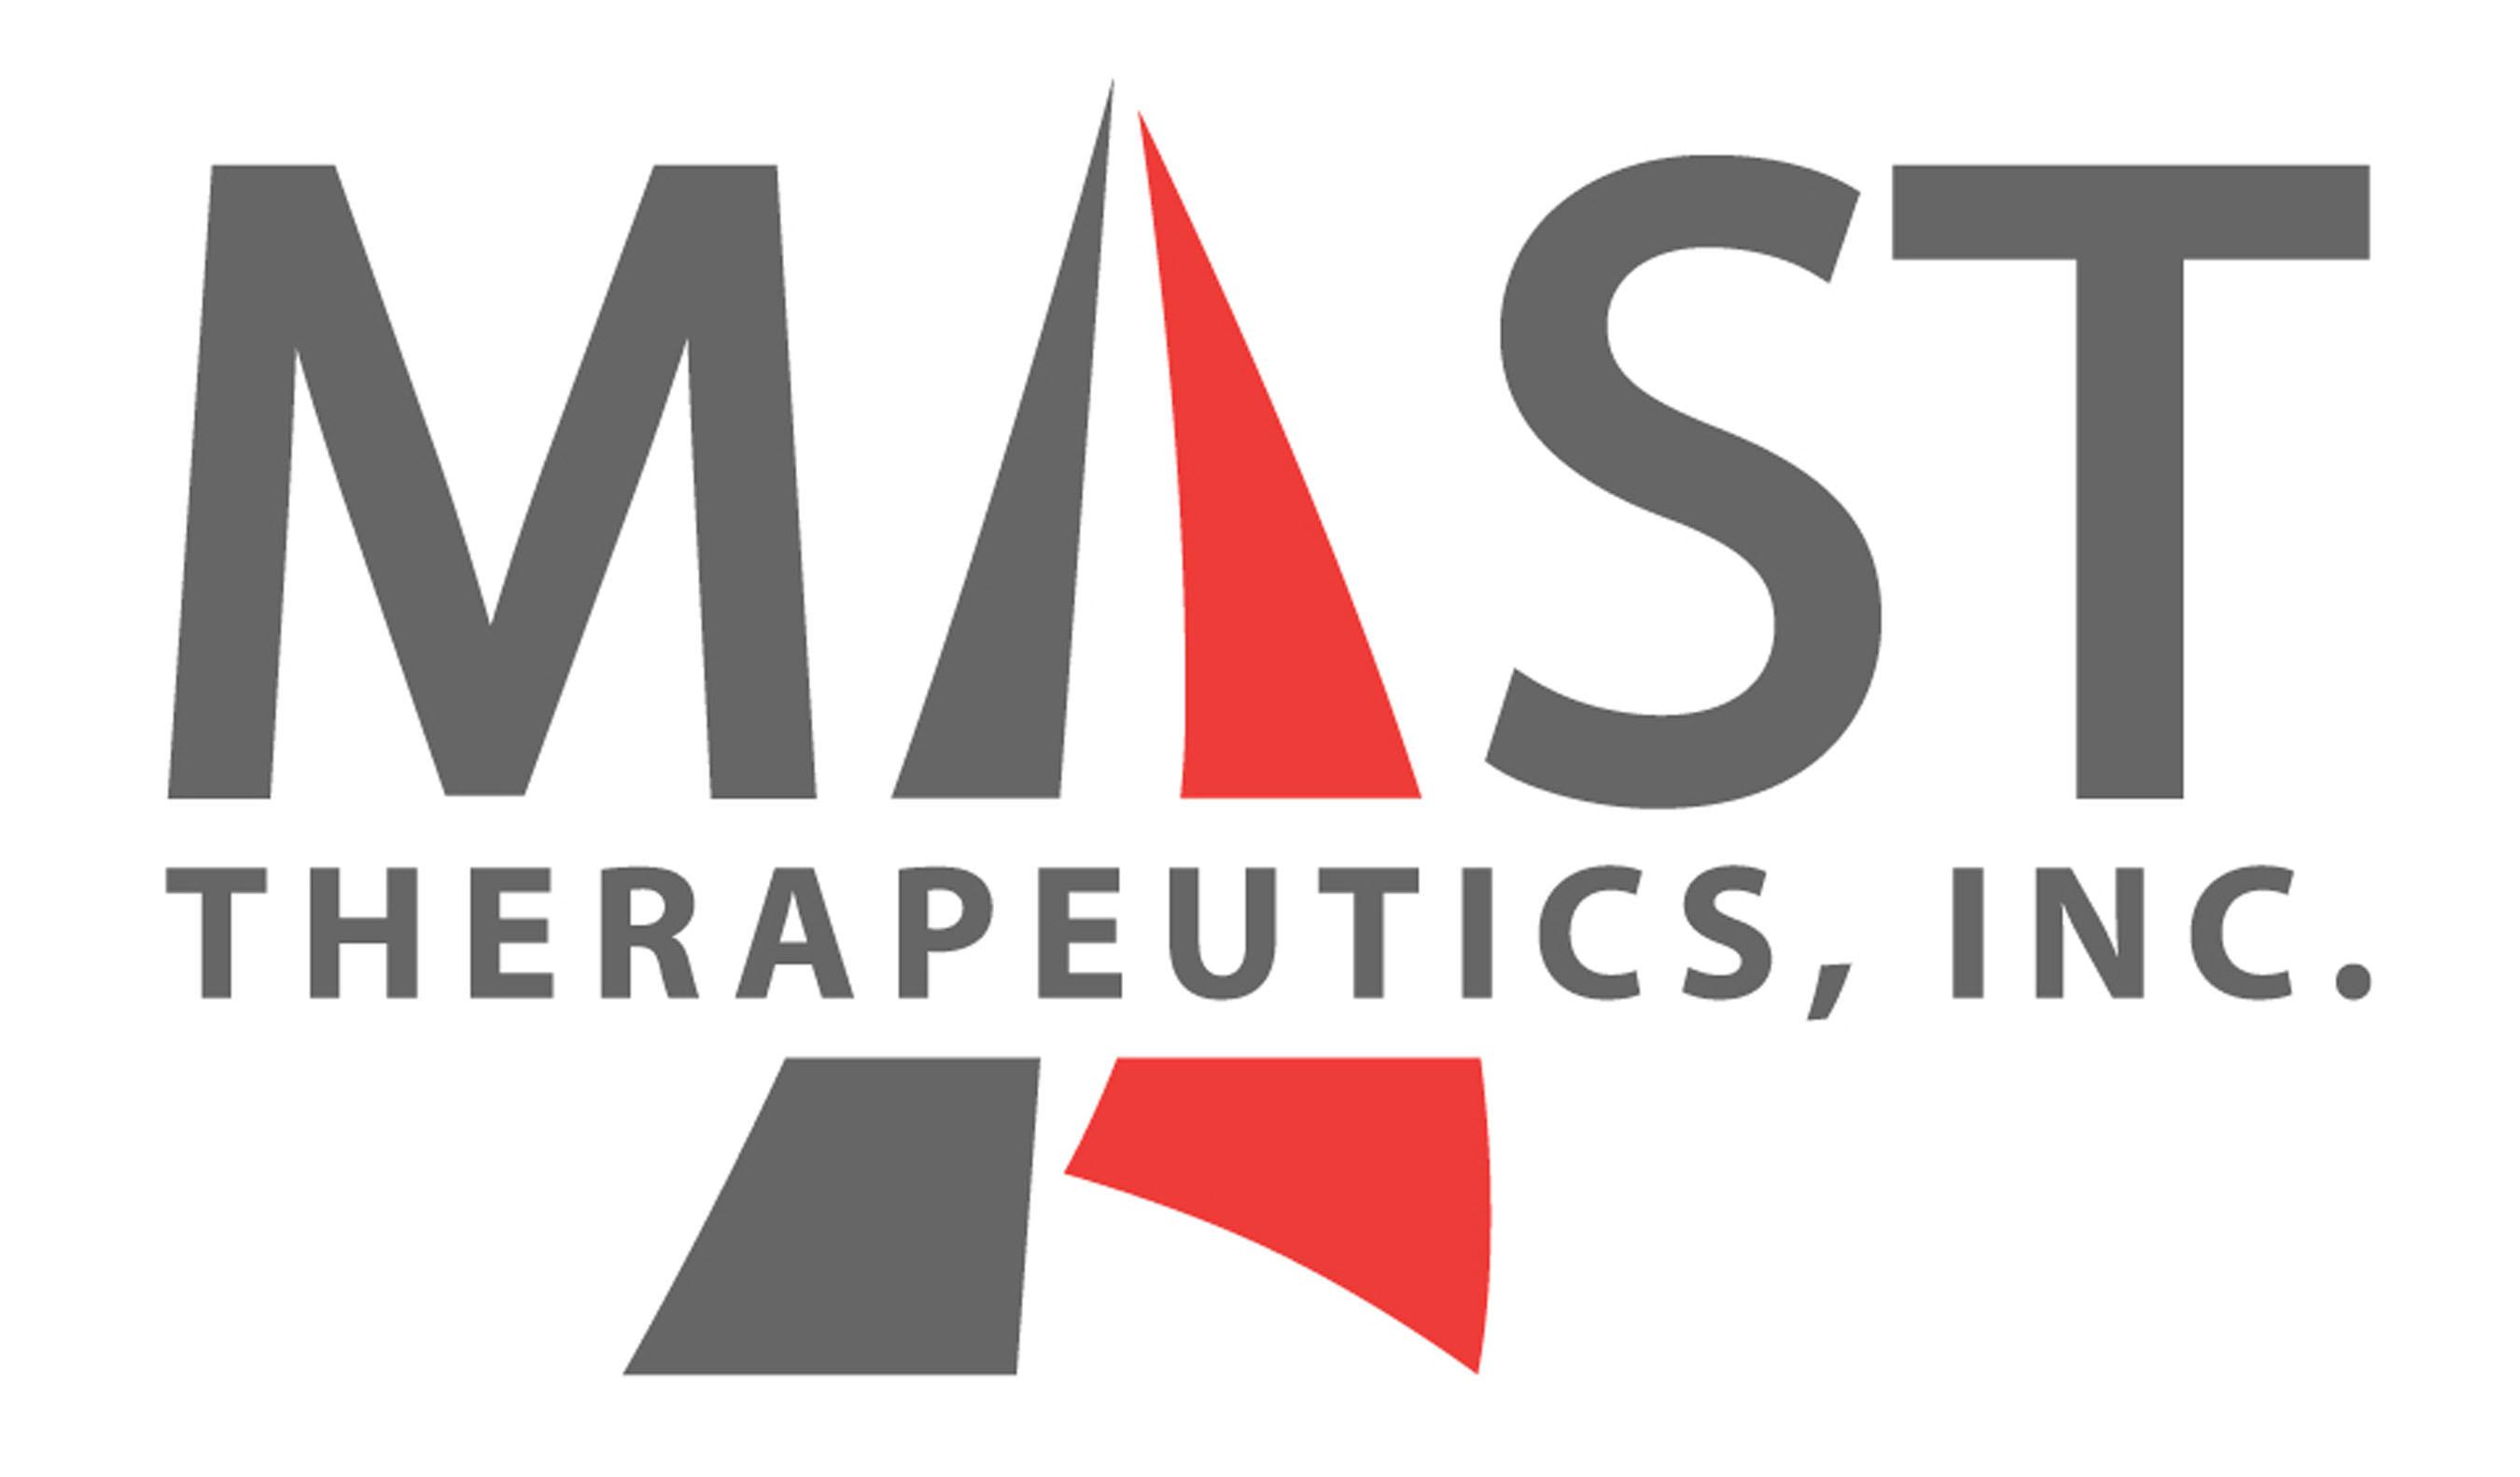 Mast Therapeutics, Inc. logo.